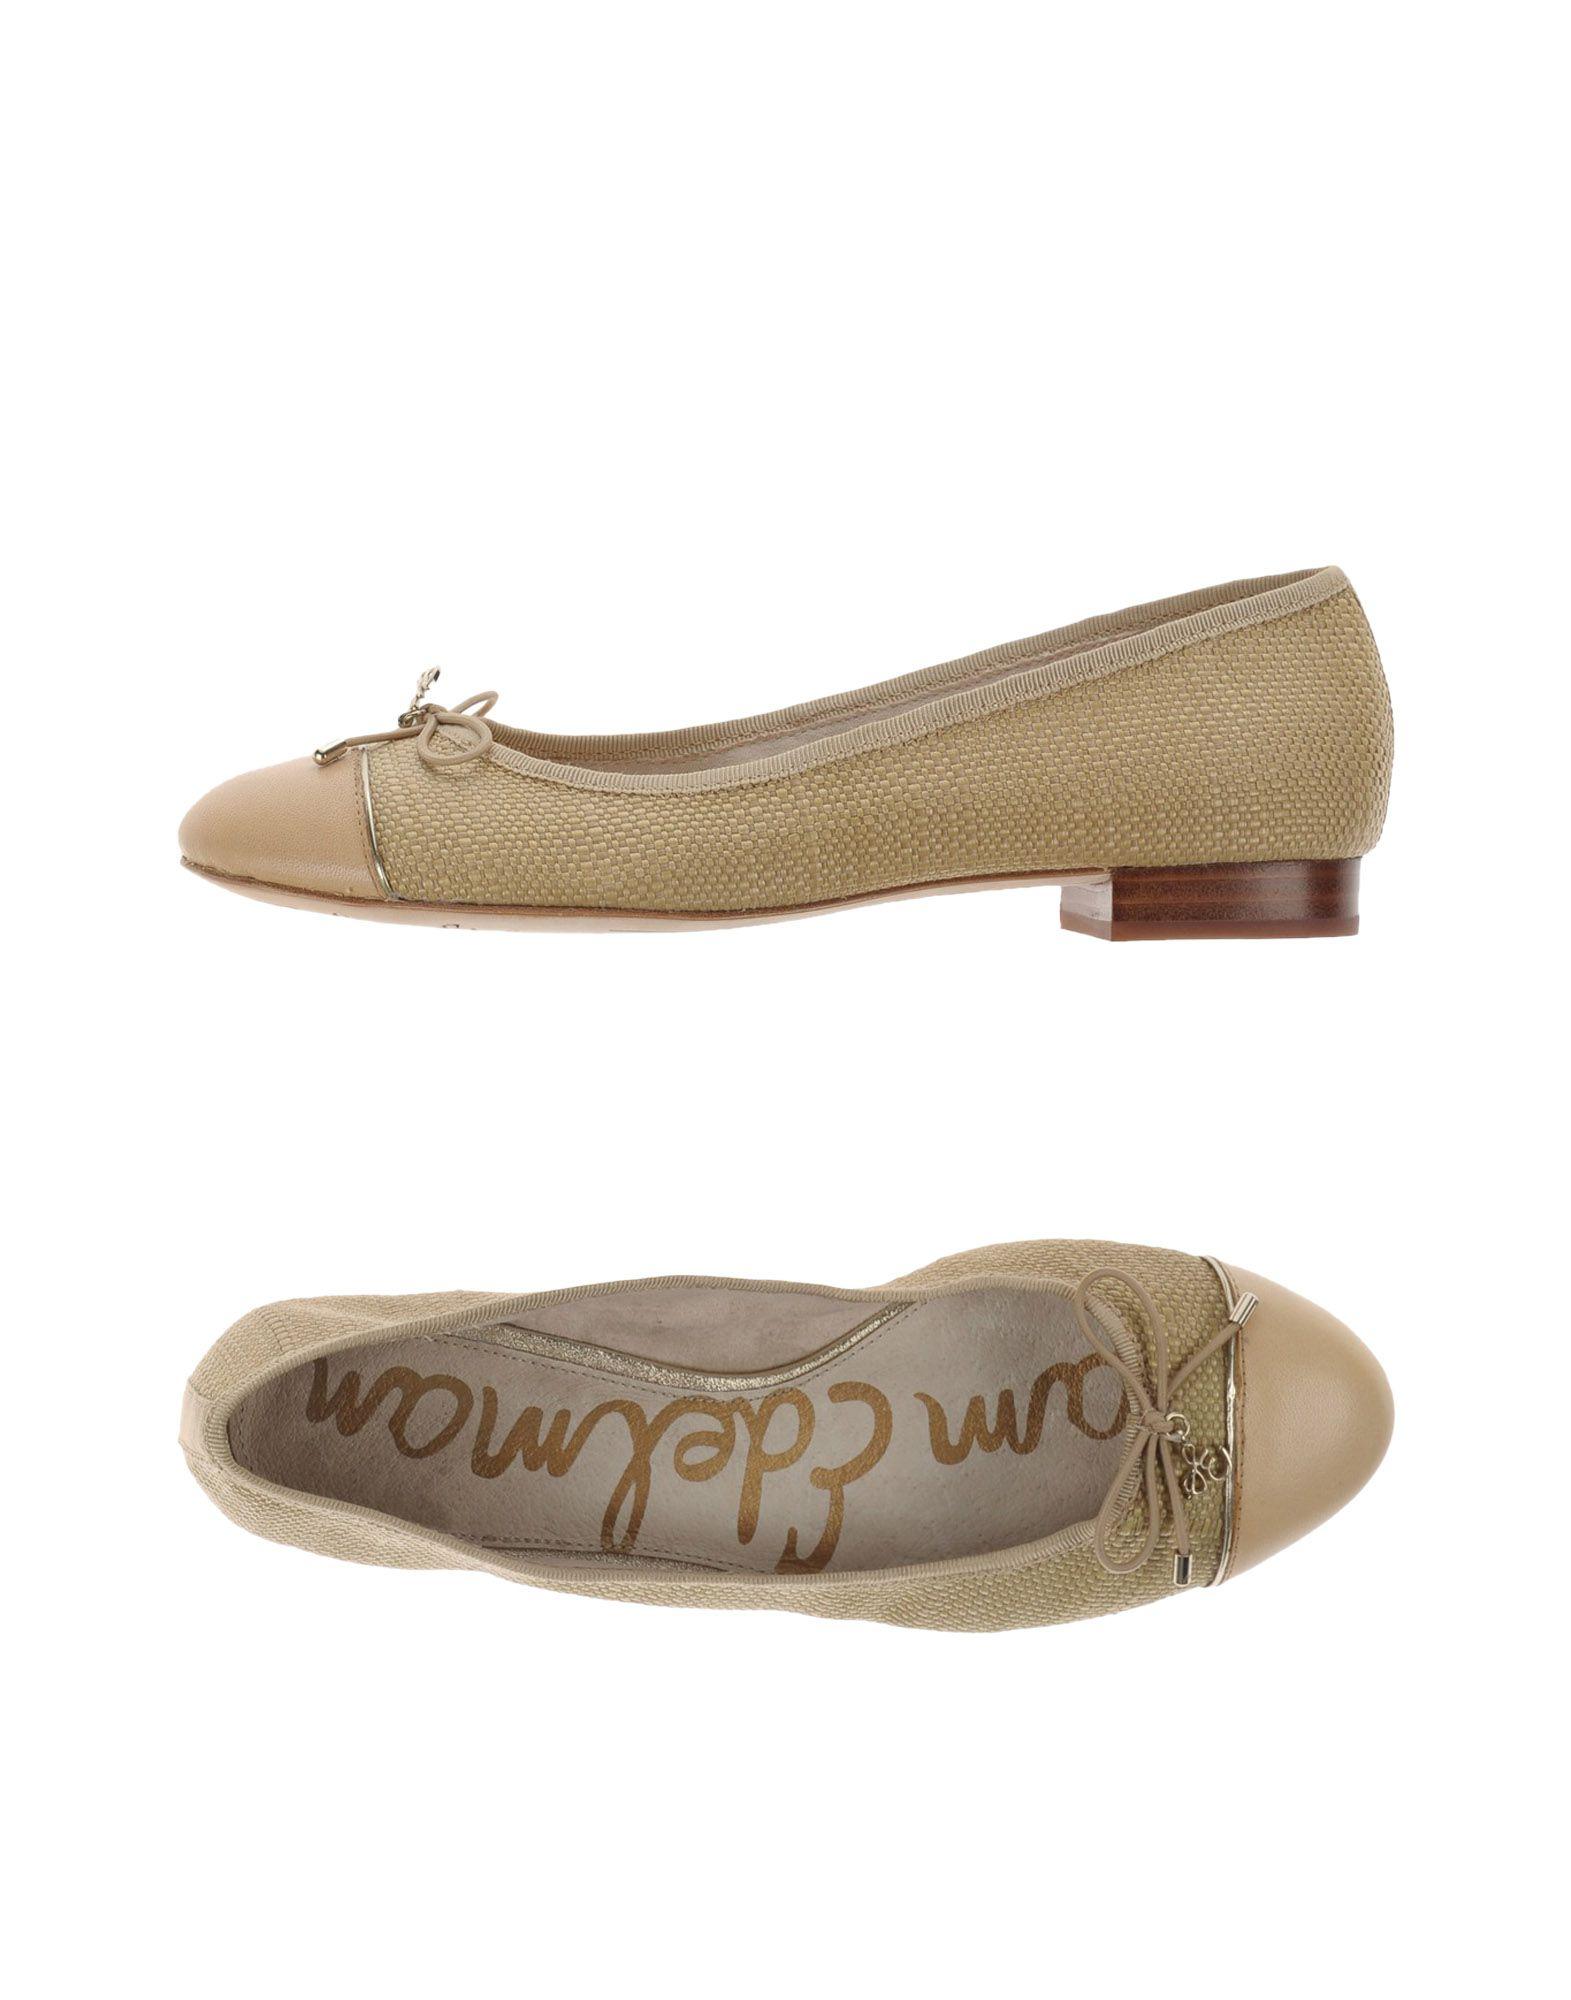 Sam 11089708AK Edelman Ballerinas Damen  11089708AK Sam Gute Qualität beliebte Schuhe d71fa5